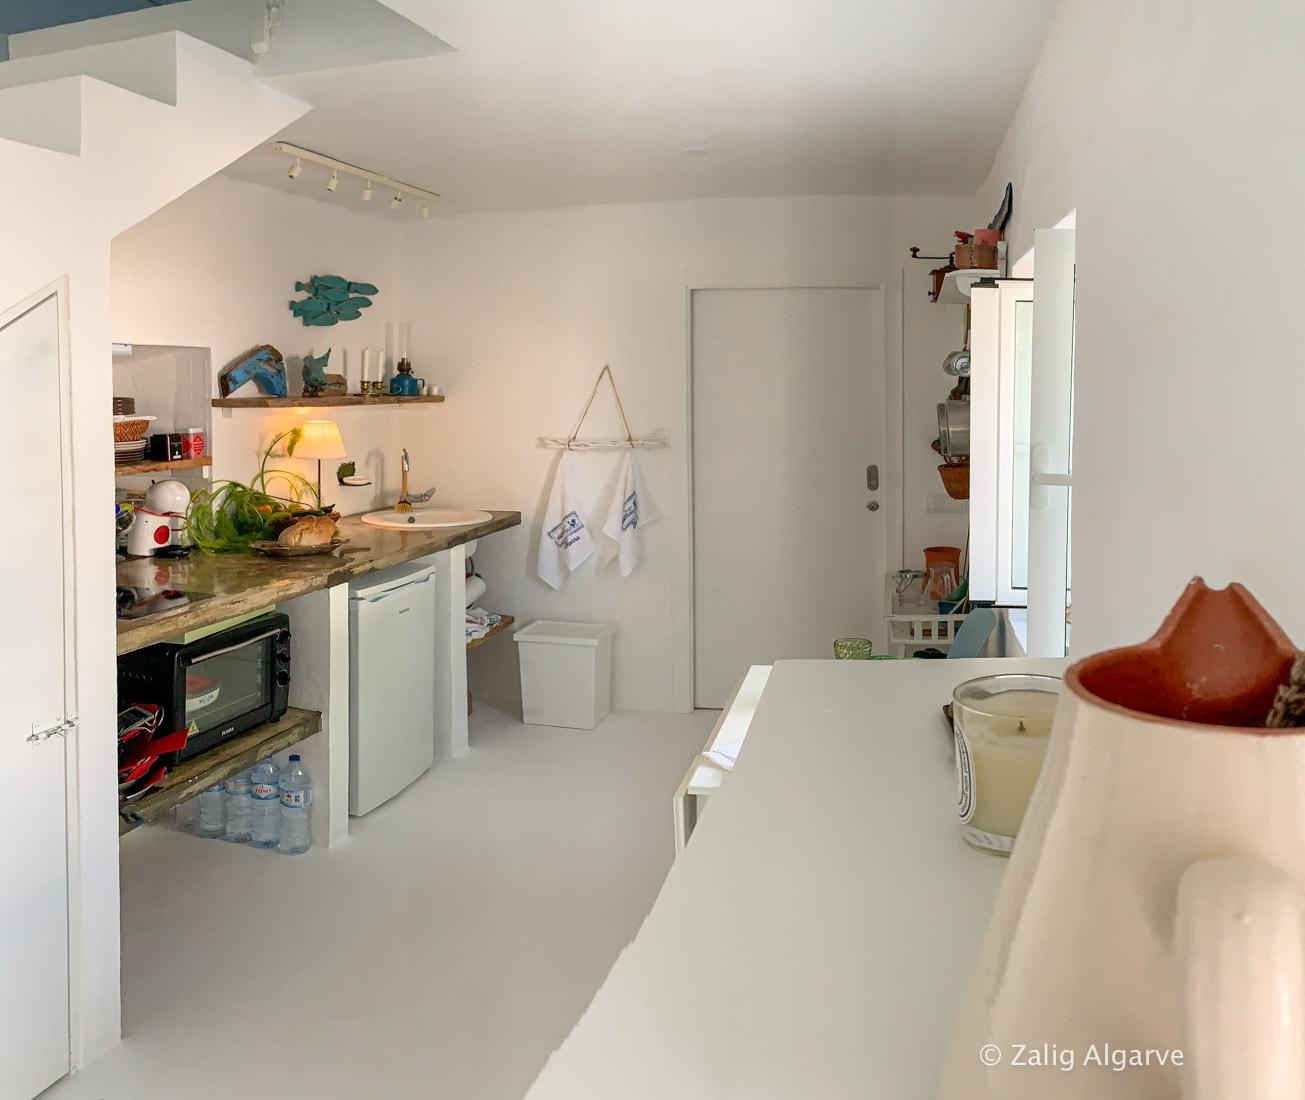 Casa-Alfarrobeira-Zalig-Algarve-17